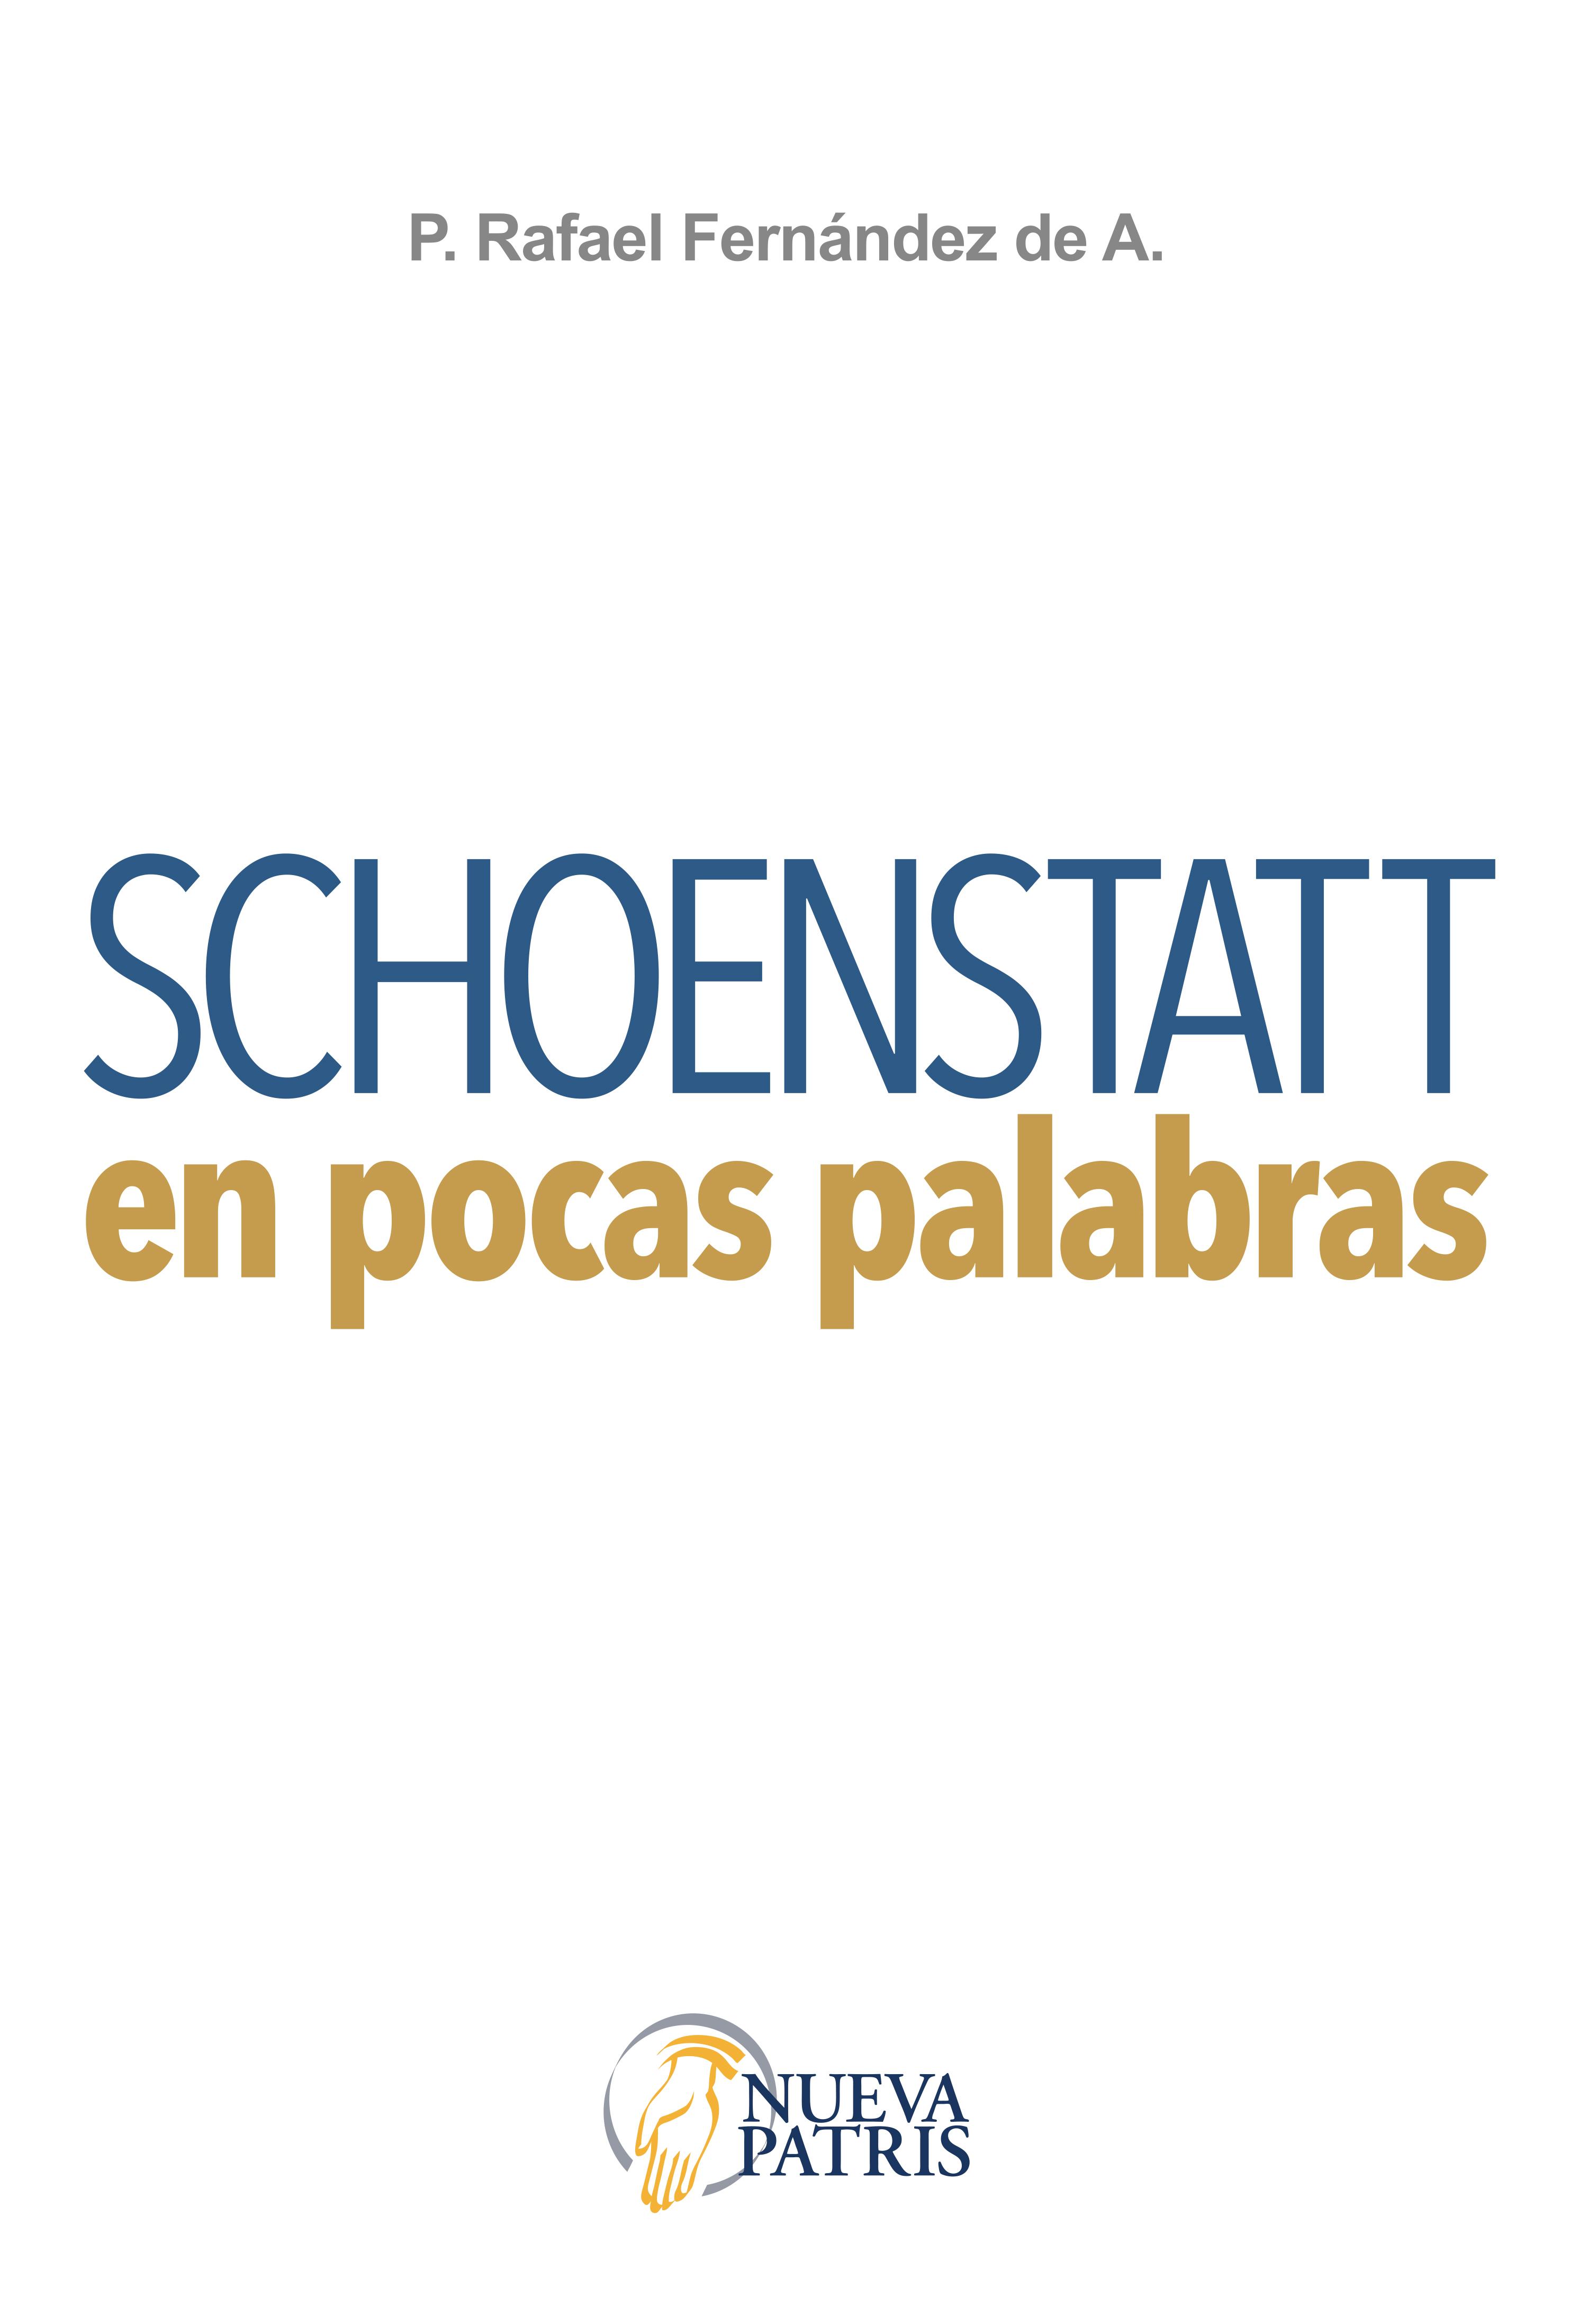 Schoenstatt en pocas palabras